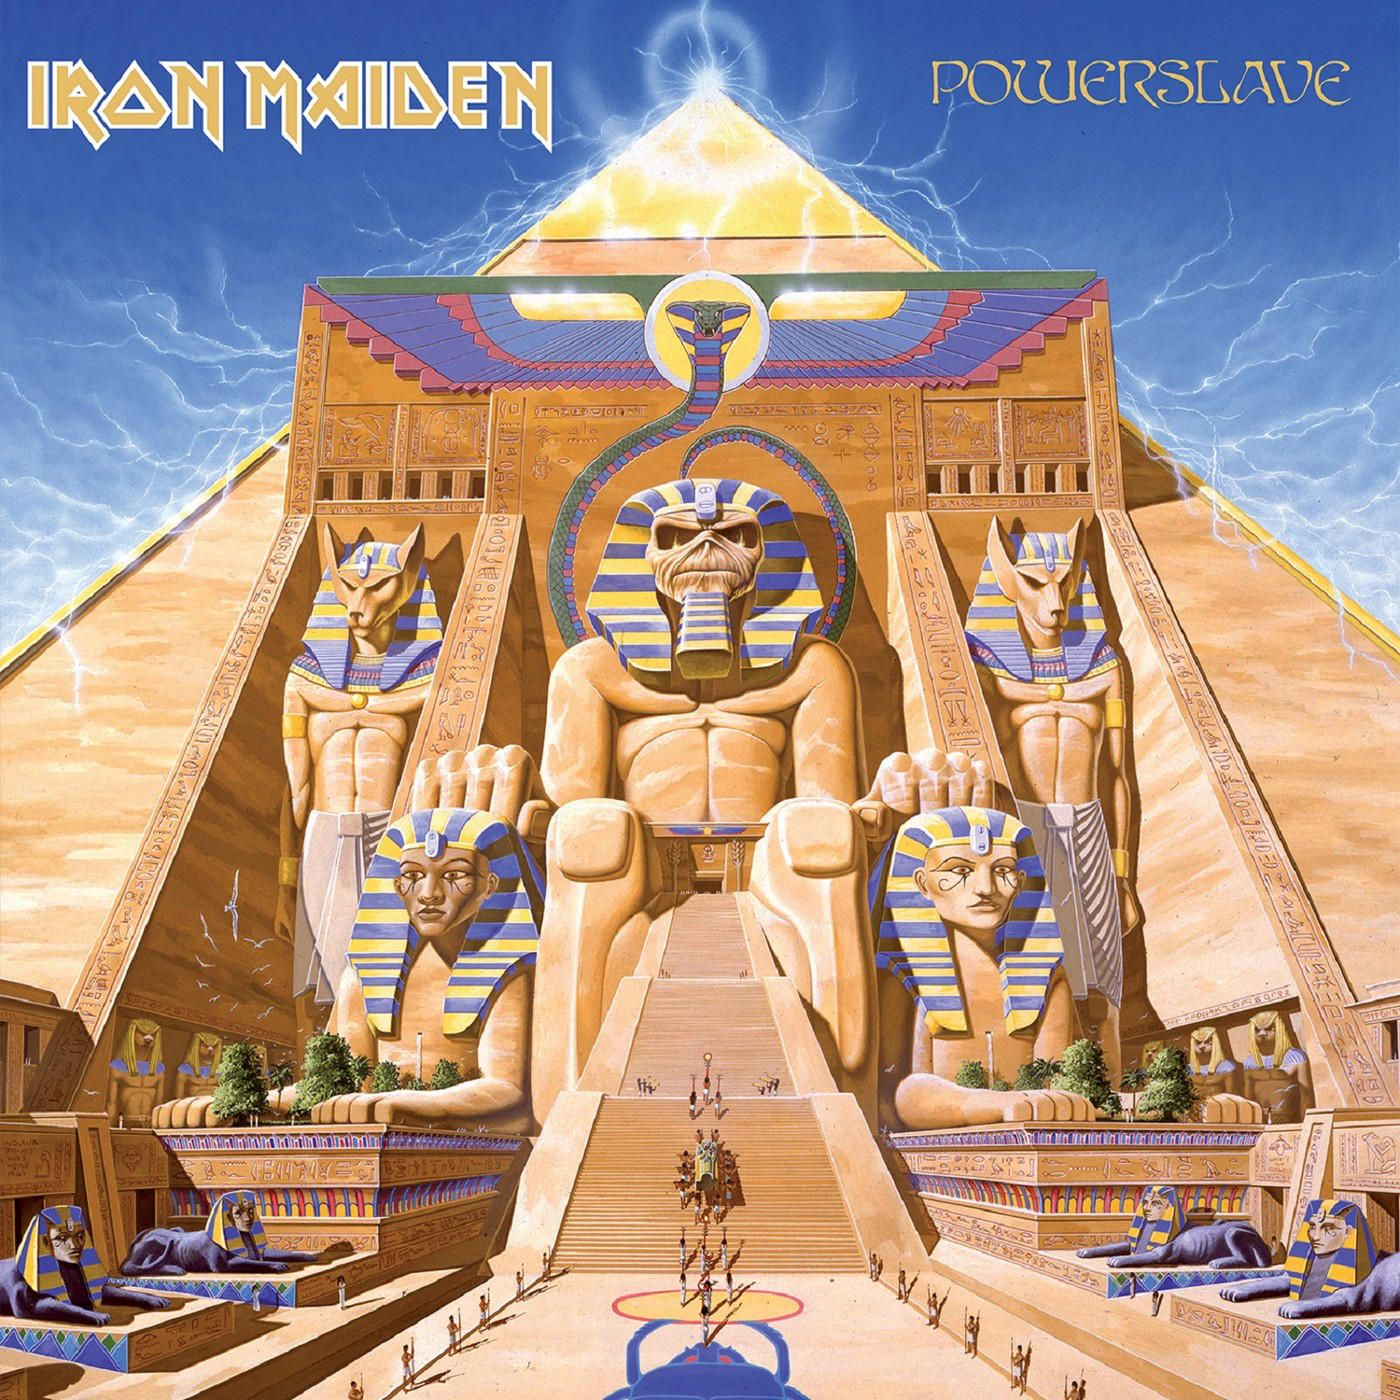 Iron Maiden - Powerslave album cover